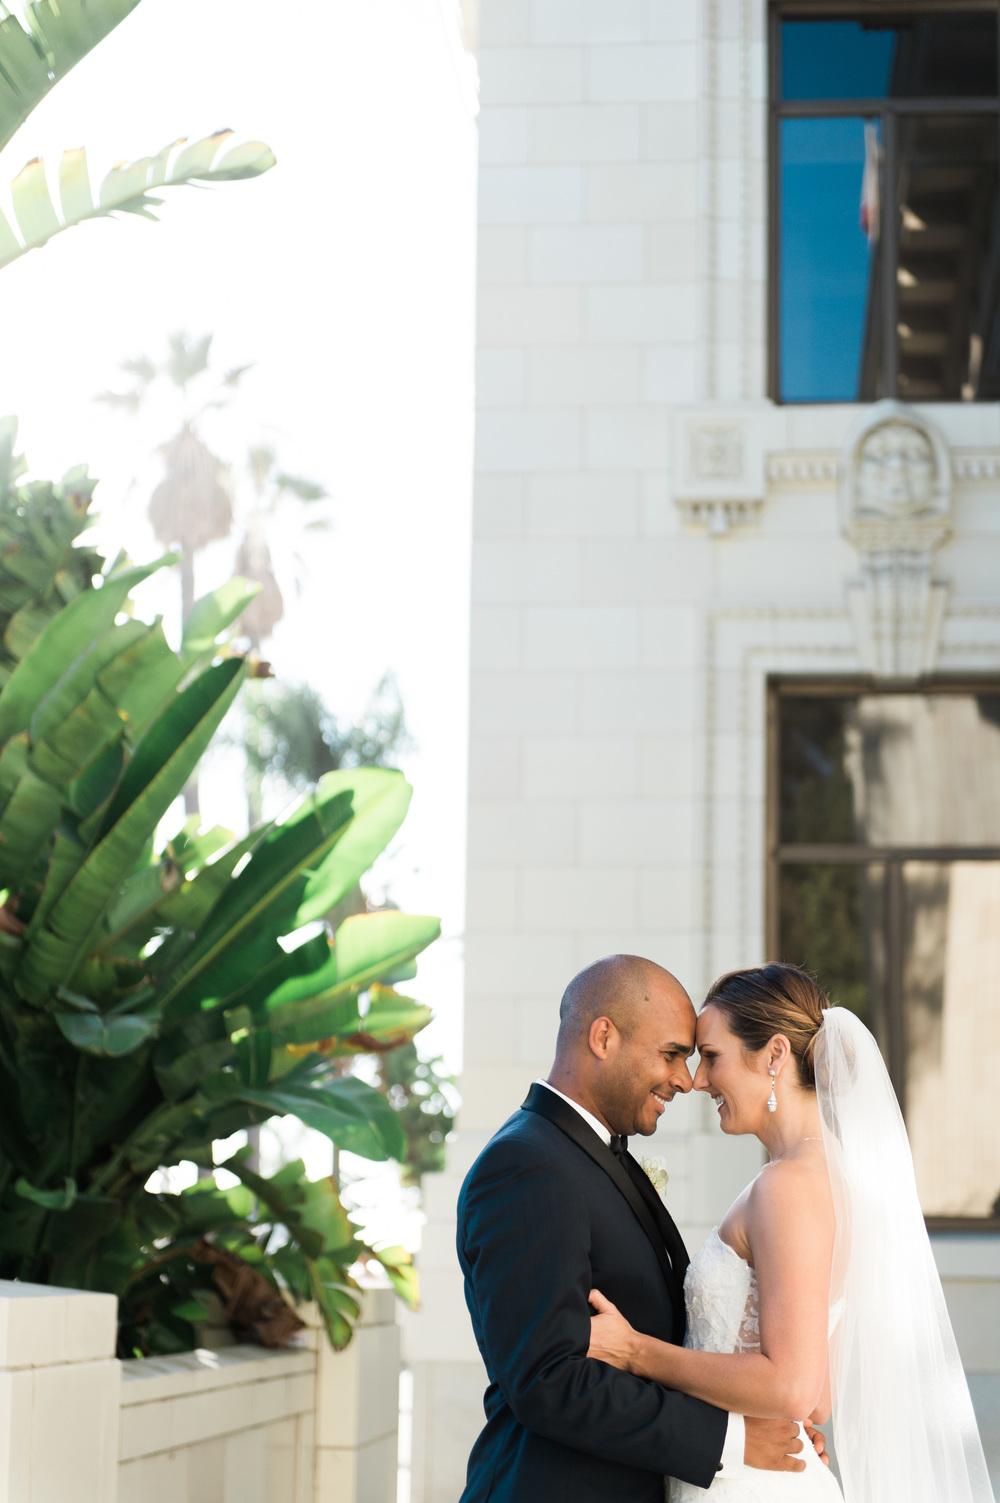 Ventura, CA Wedding Photographer | Jennifer Lourie